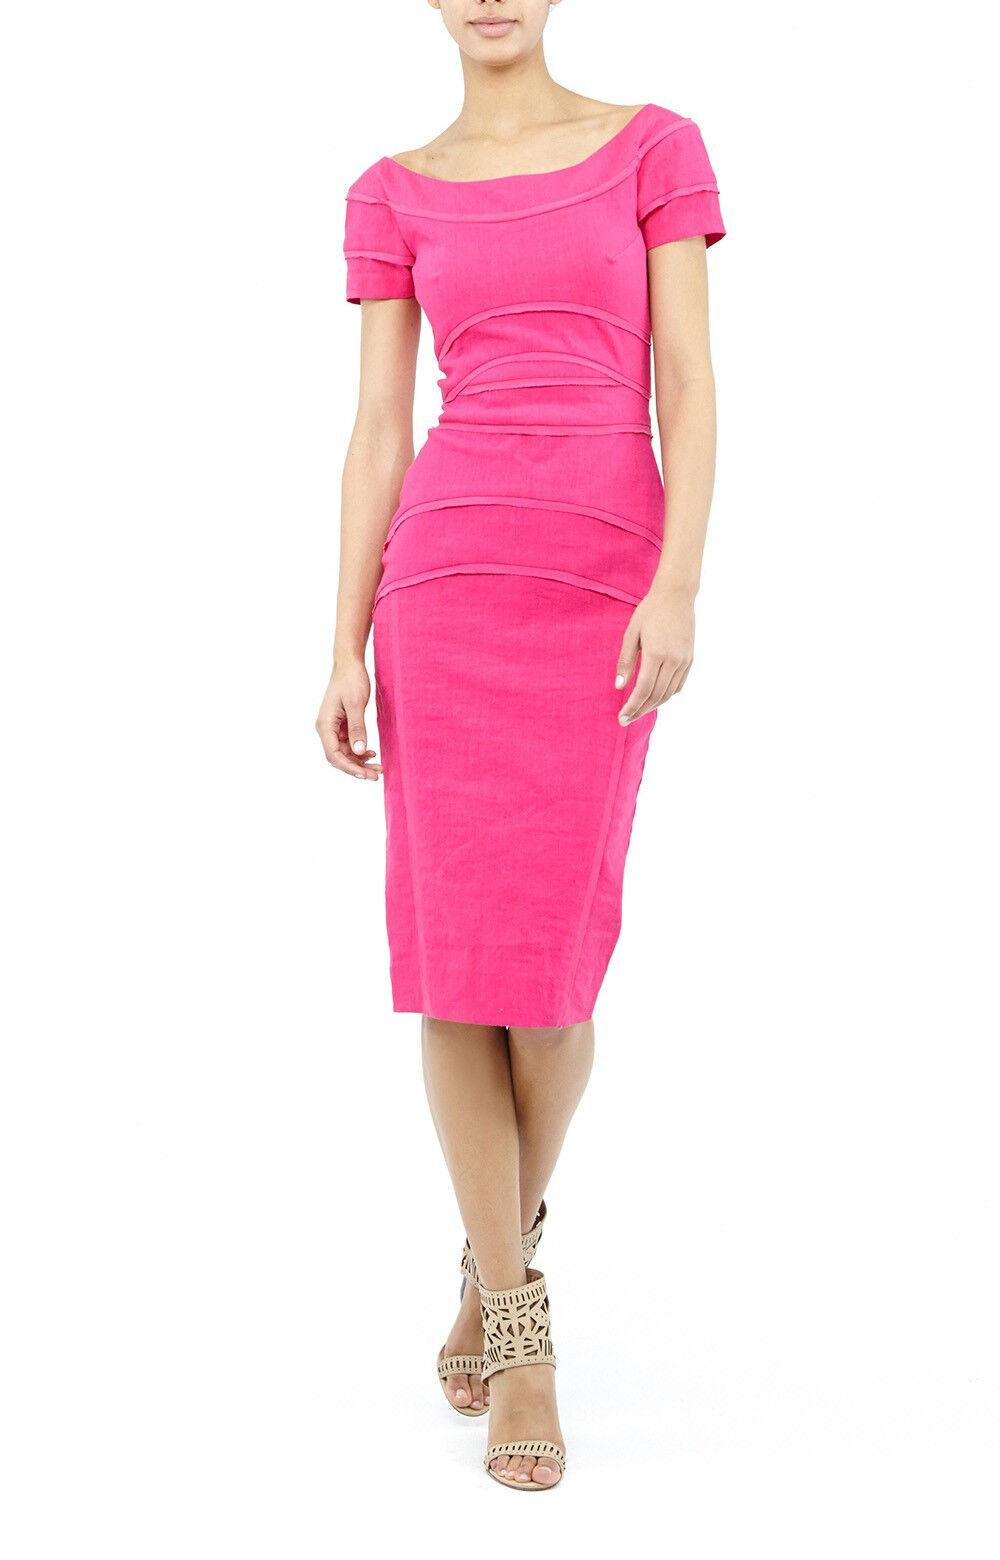 NICOLE MILLER  KARINA Cuello Bote Mezcla De Lino Stretch Vestido Berry Talla 0  320 BJ10014  distribución global